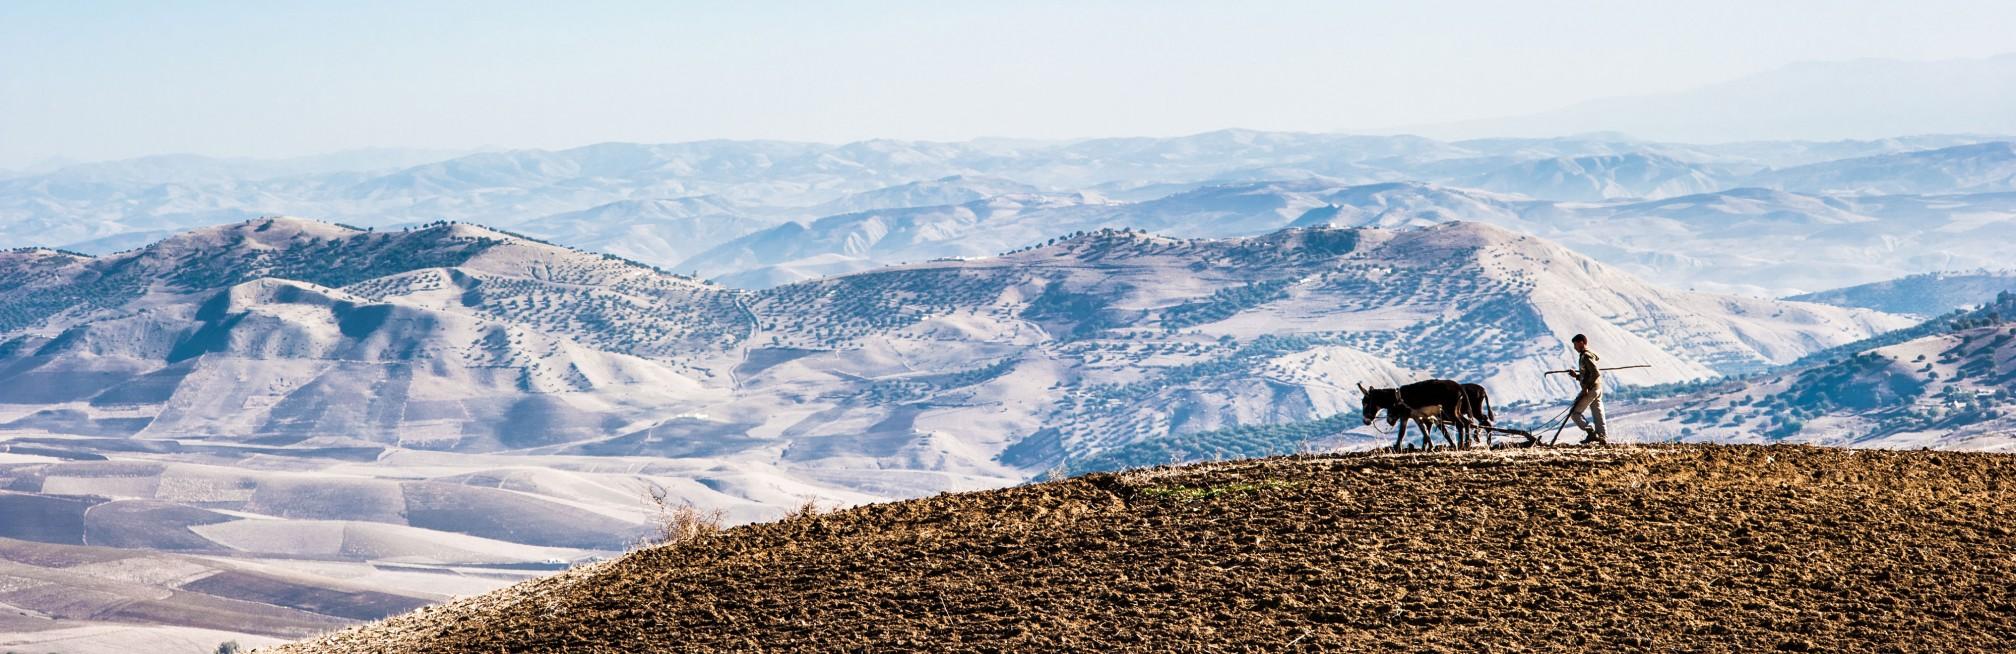 The ultimate Moroccan adventure